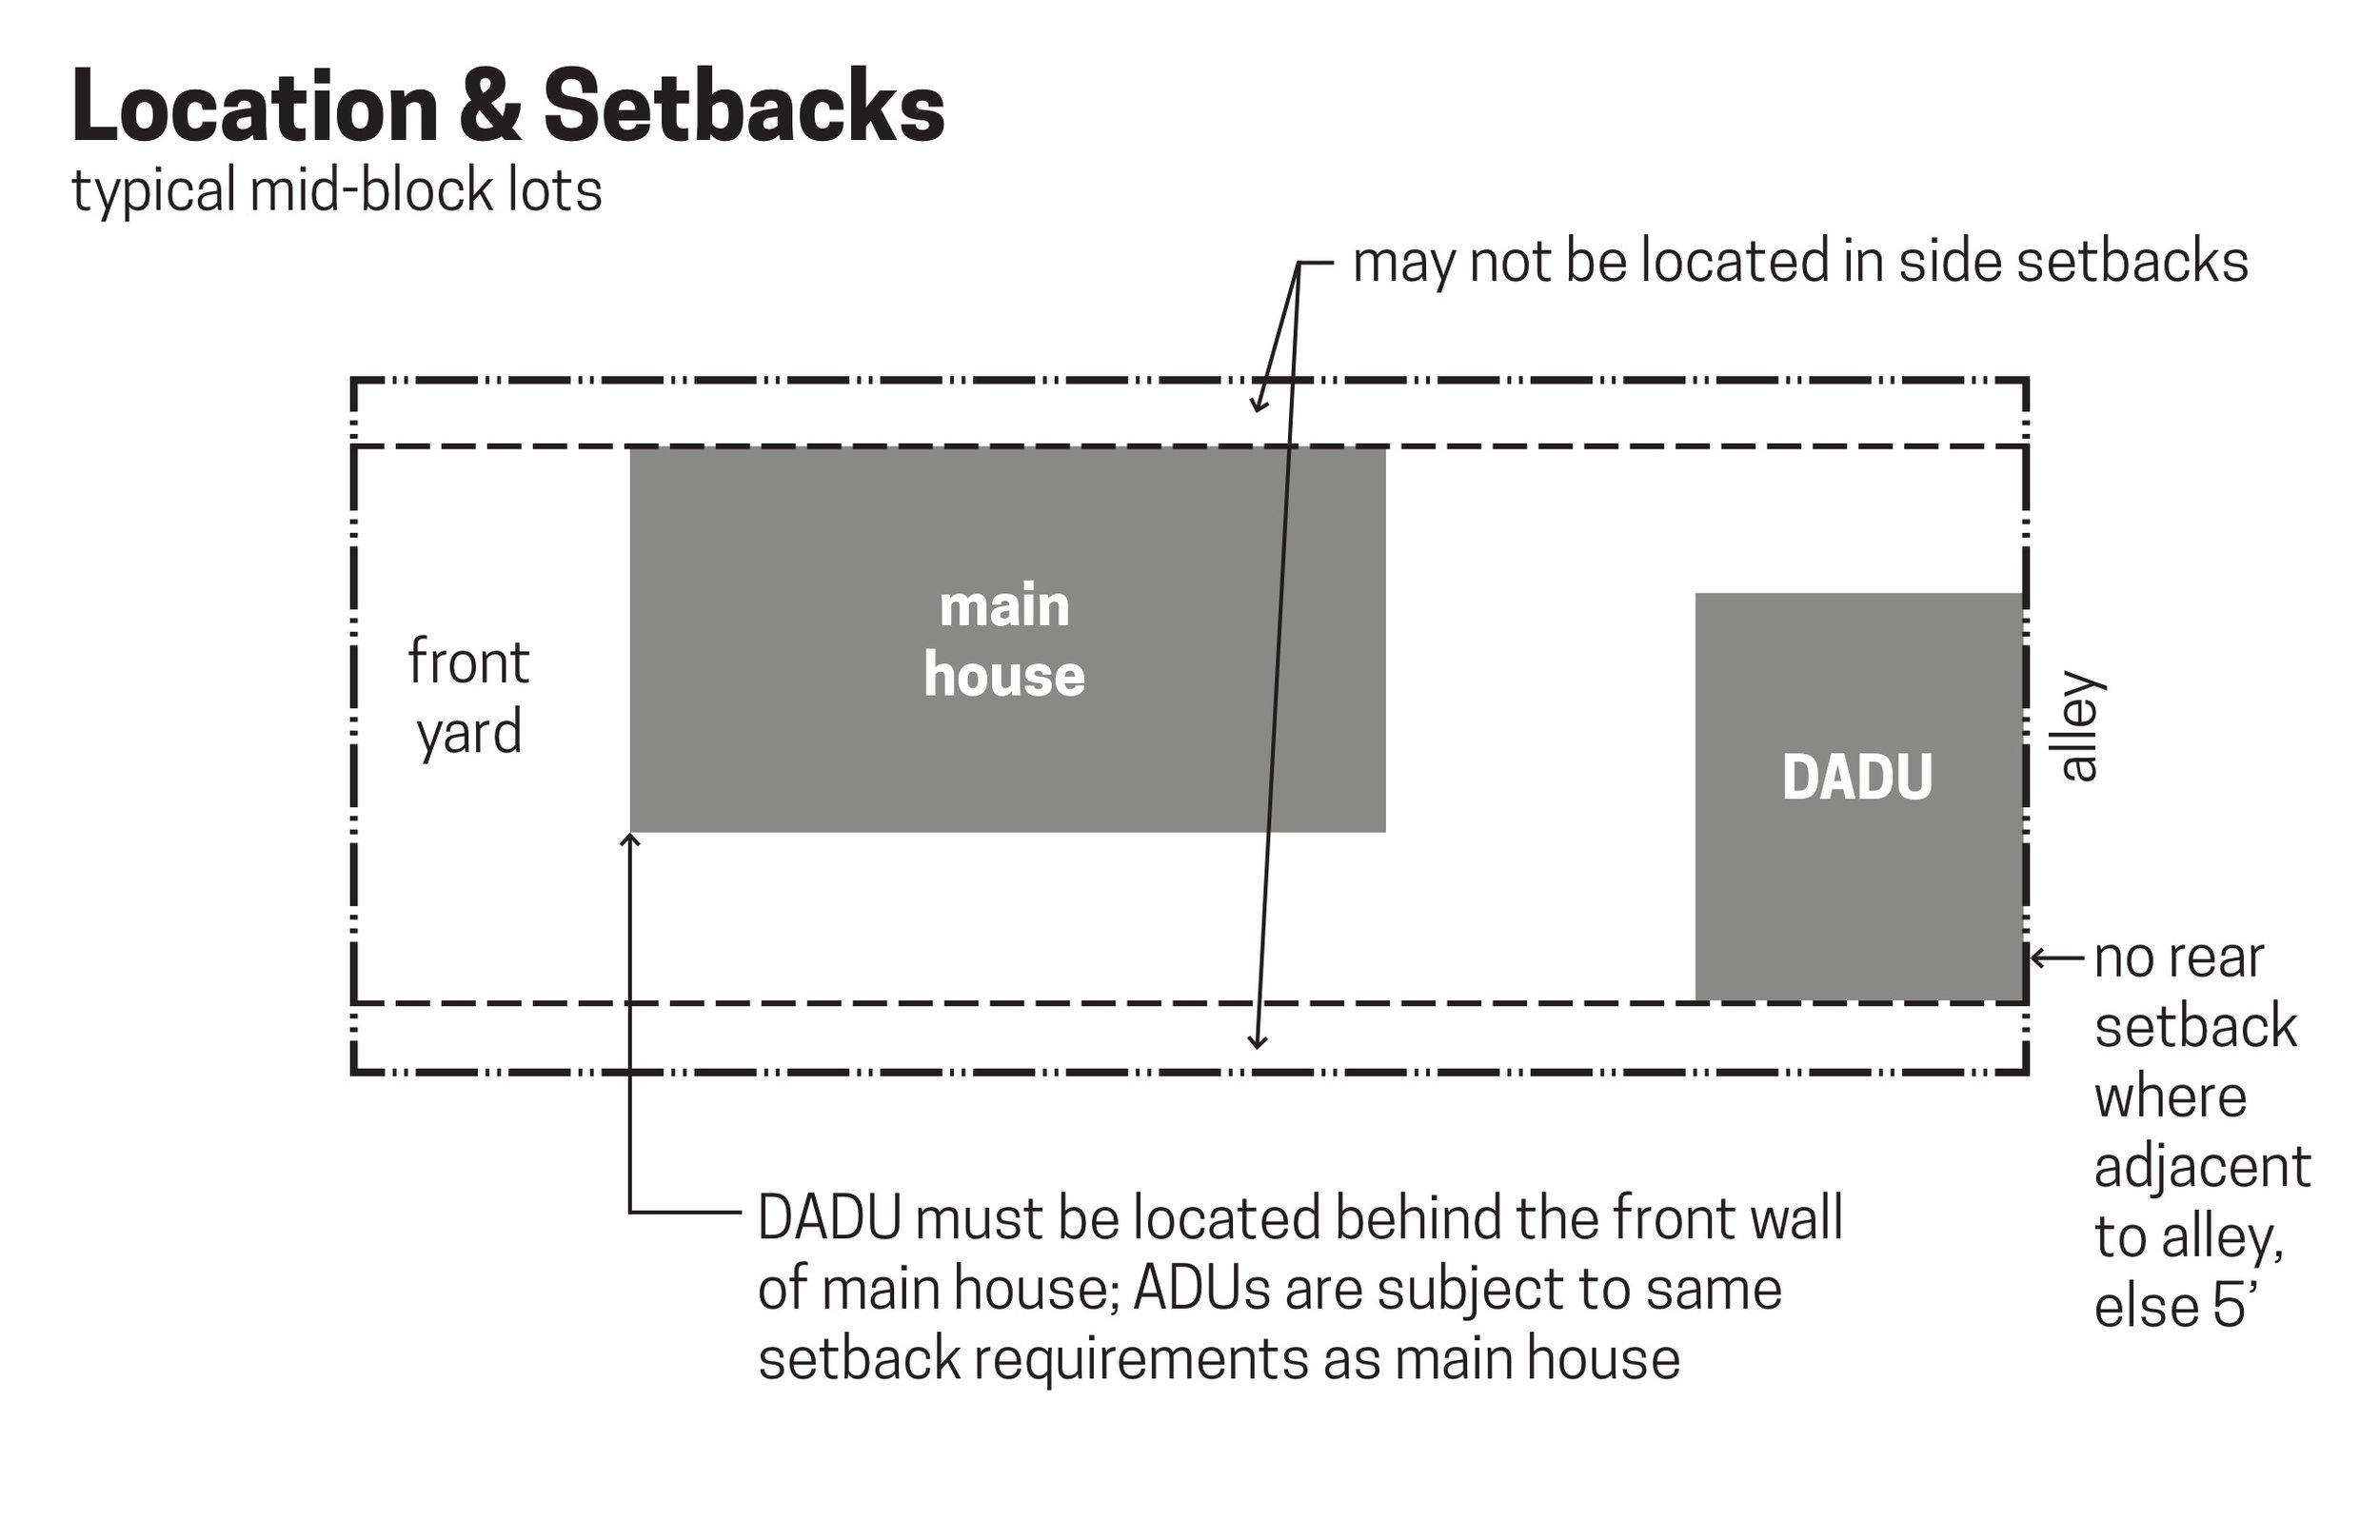 wc-studio-DADU-location-setbacks-mid-block.jpg